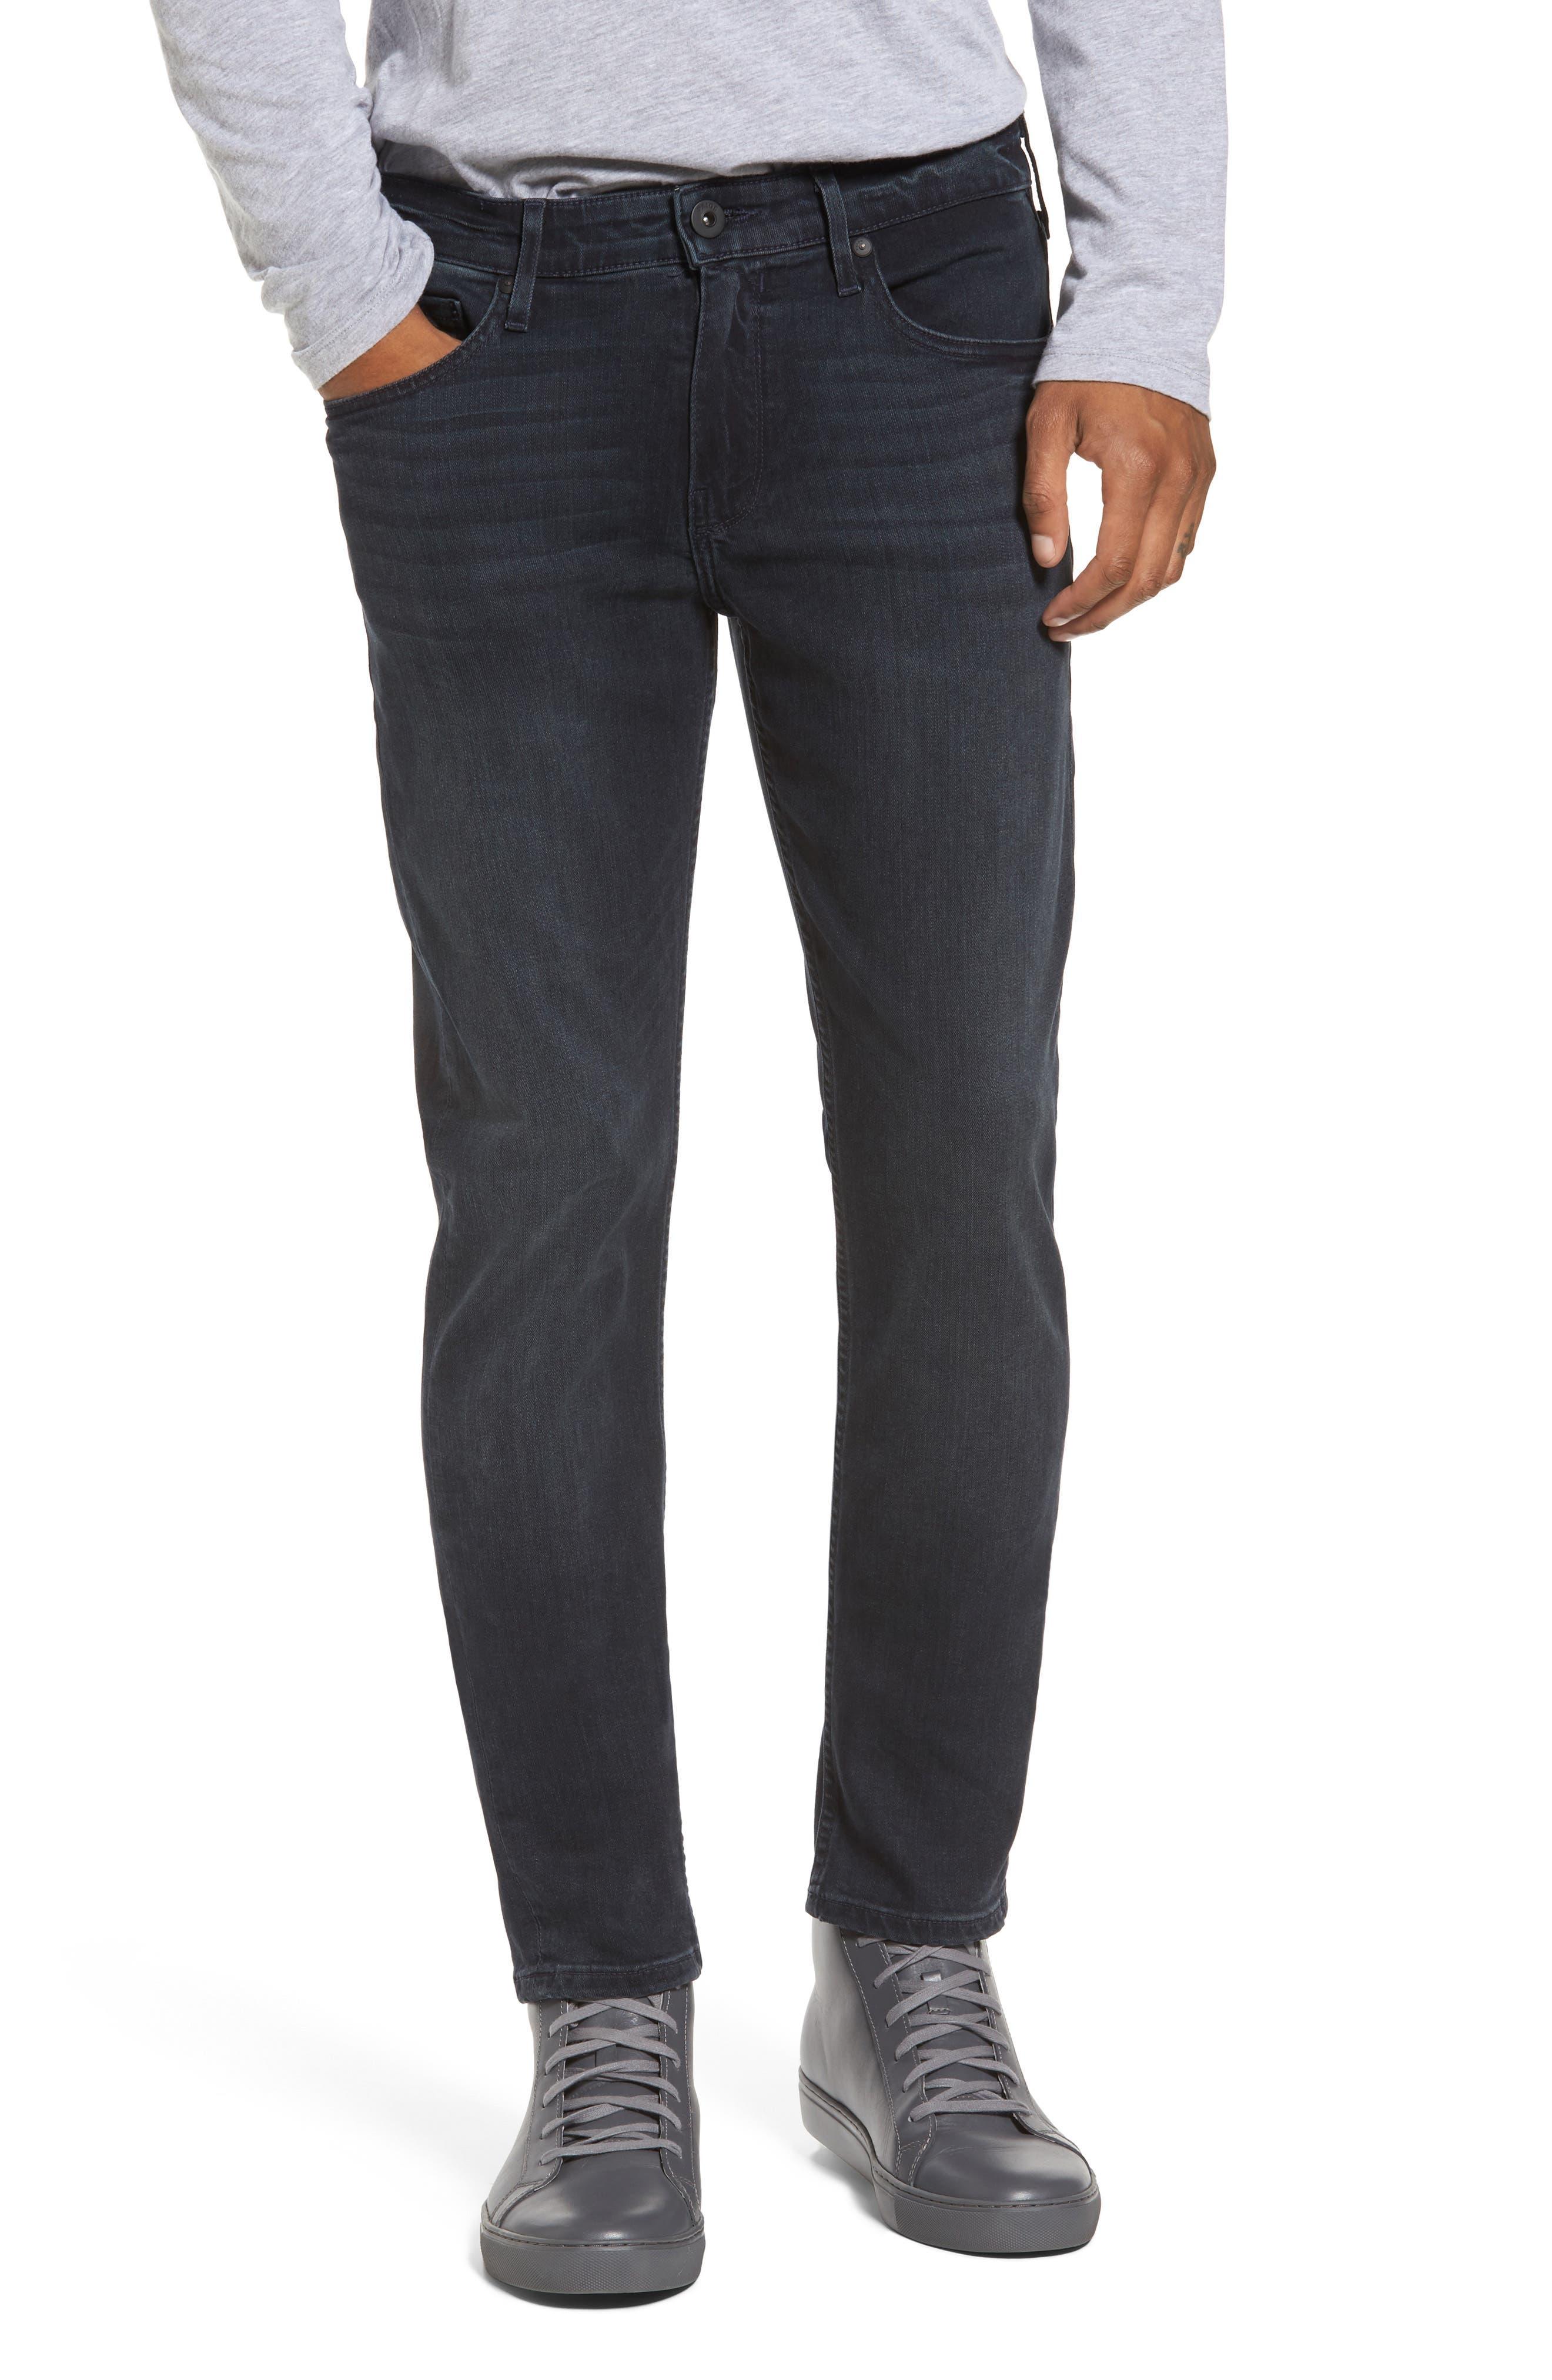 Transcend - Croft Skinny Fit Jeans,                         Main,                         color, Beckett